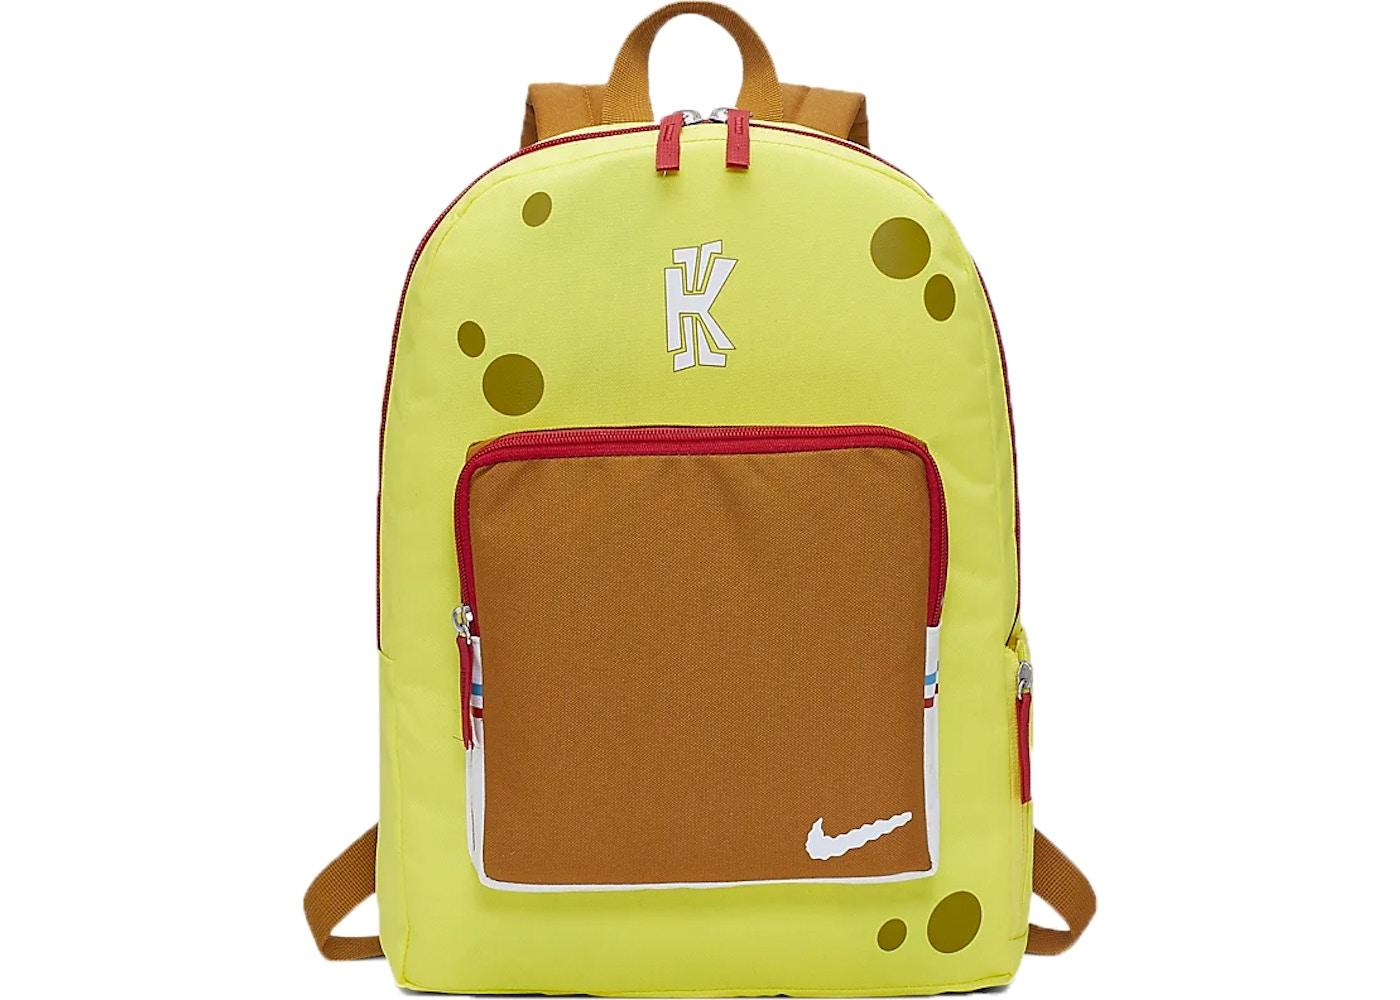 Por ahí equipo Obligatorio  Nike Kyrie x Spongebob Backpack Dynamic Yellow